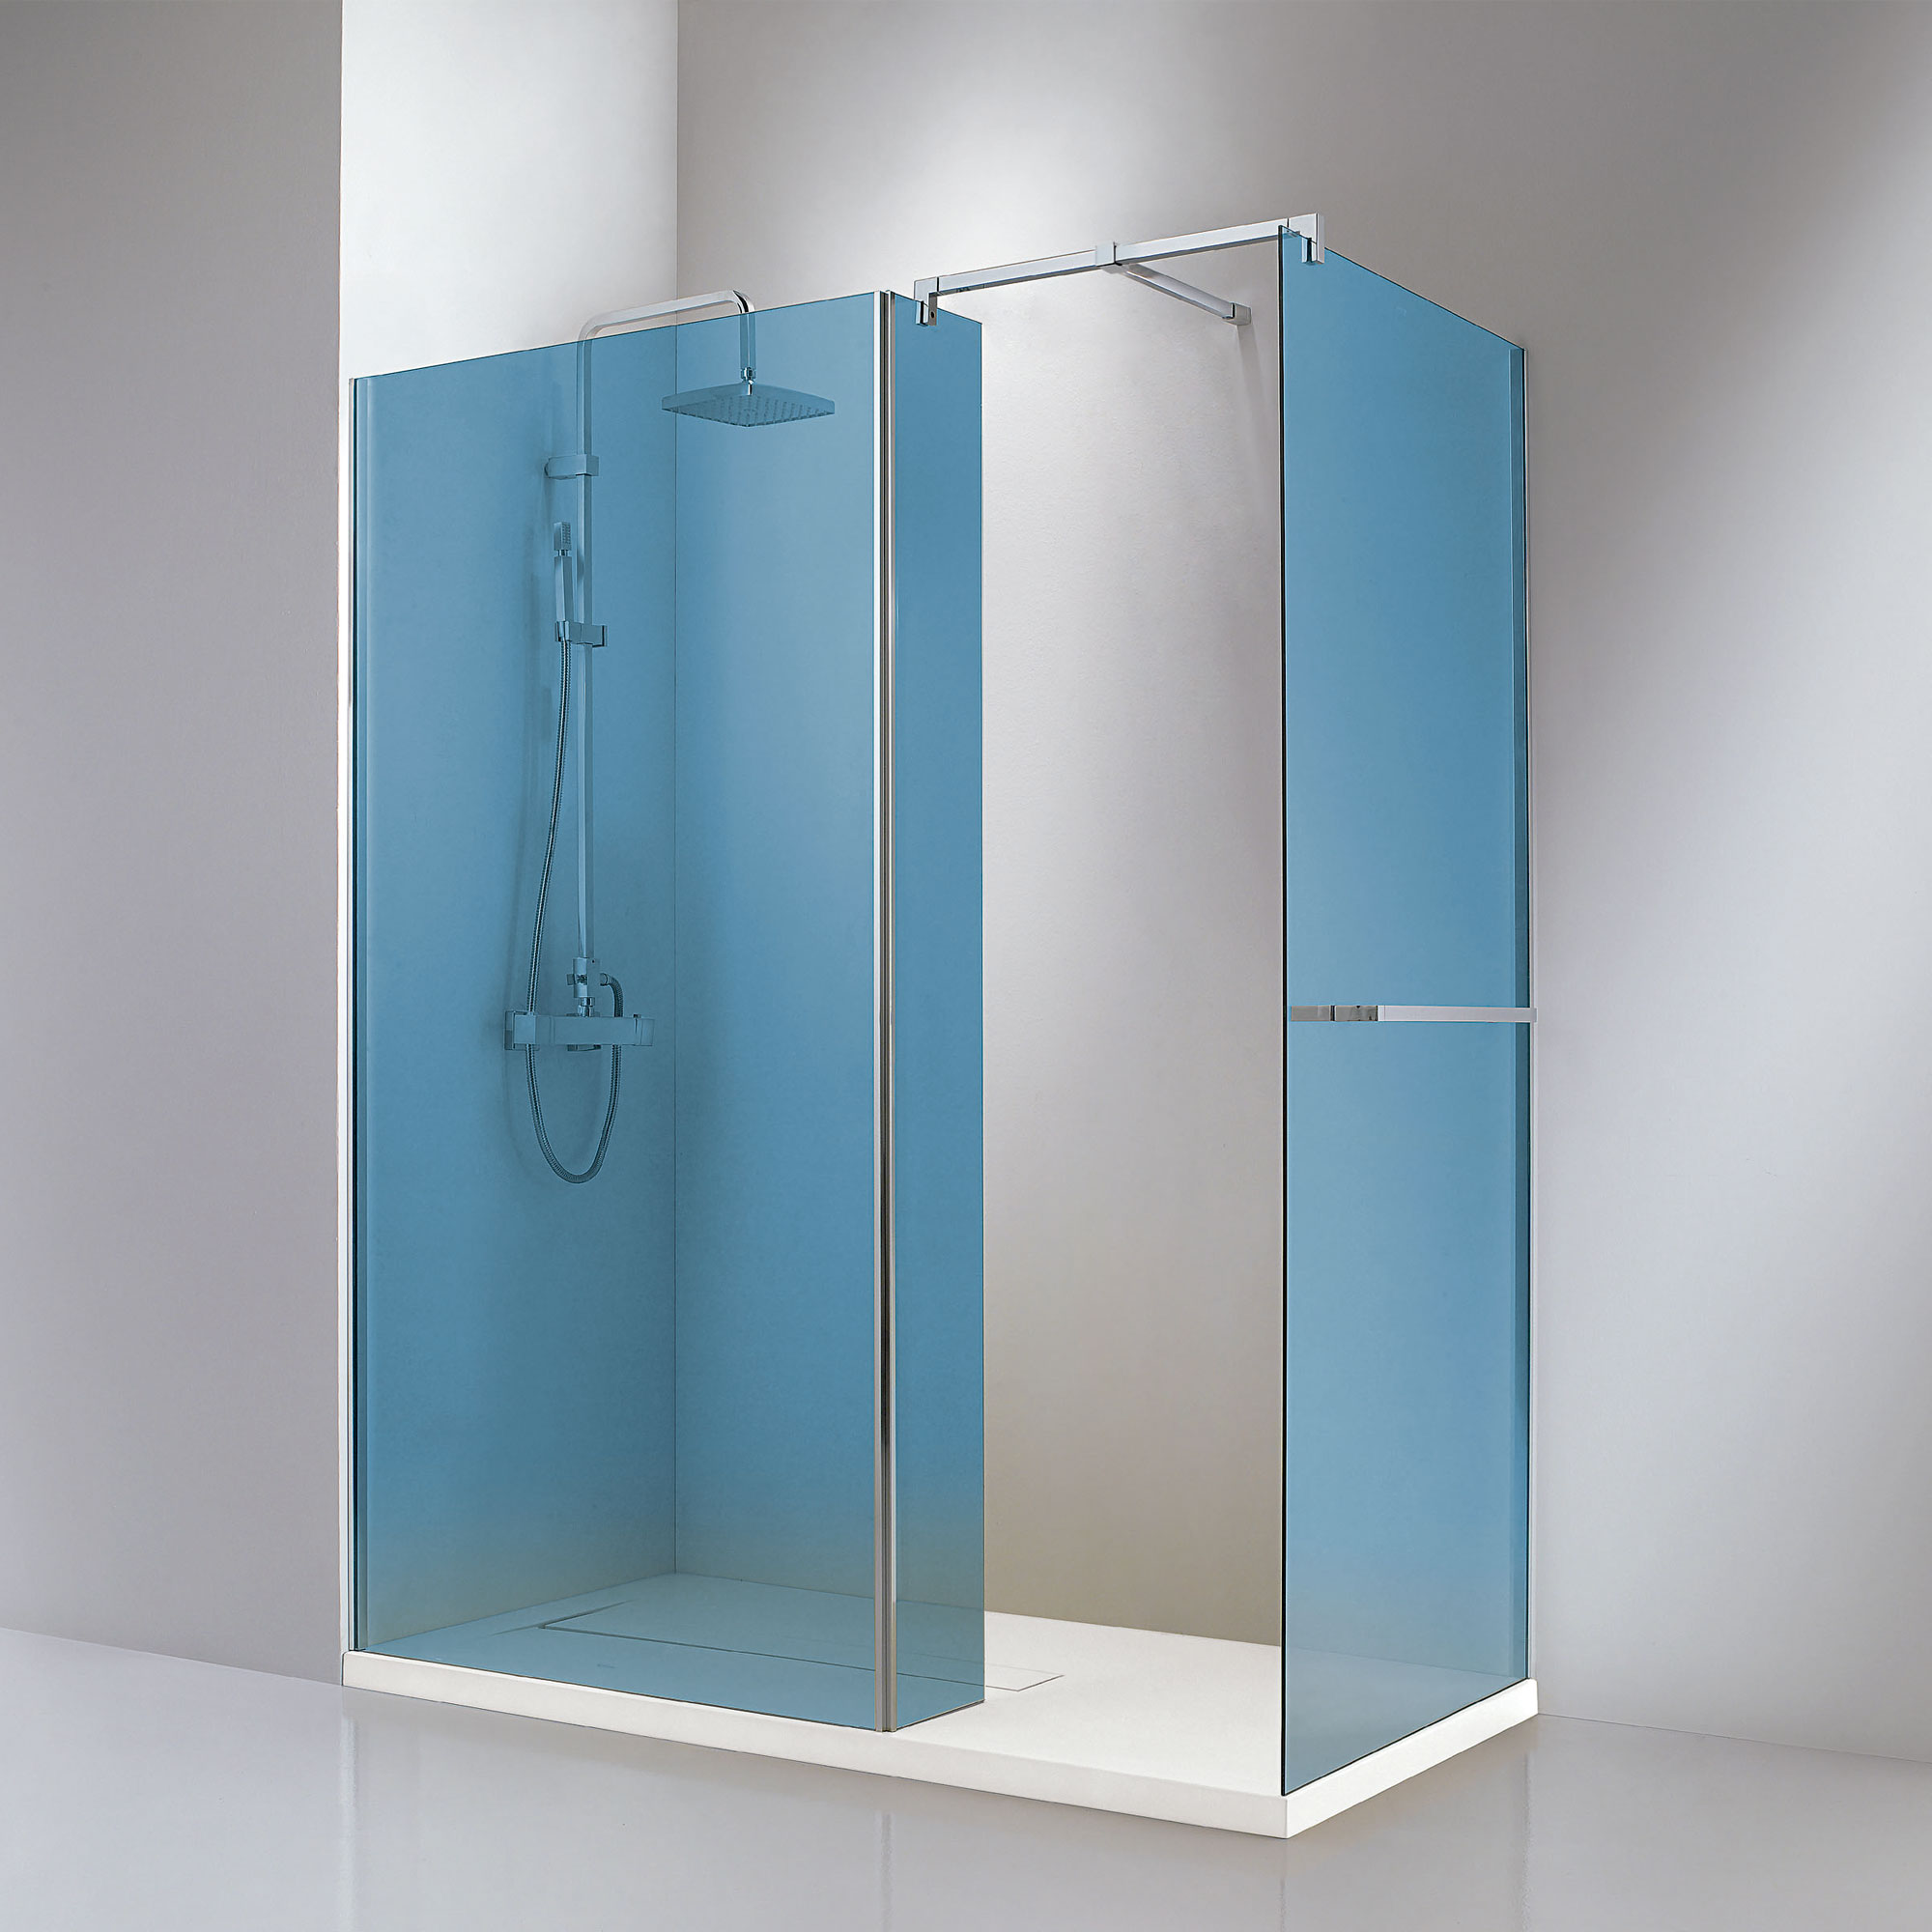 Nueva selecci n de mamparas de ducha de profiltek grup gamma - Perfiles mamparas ducha ...